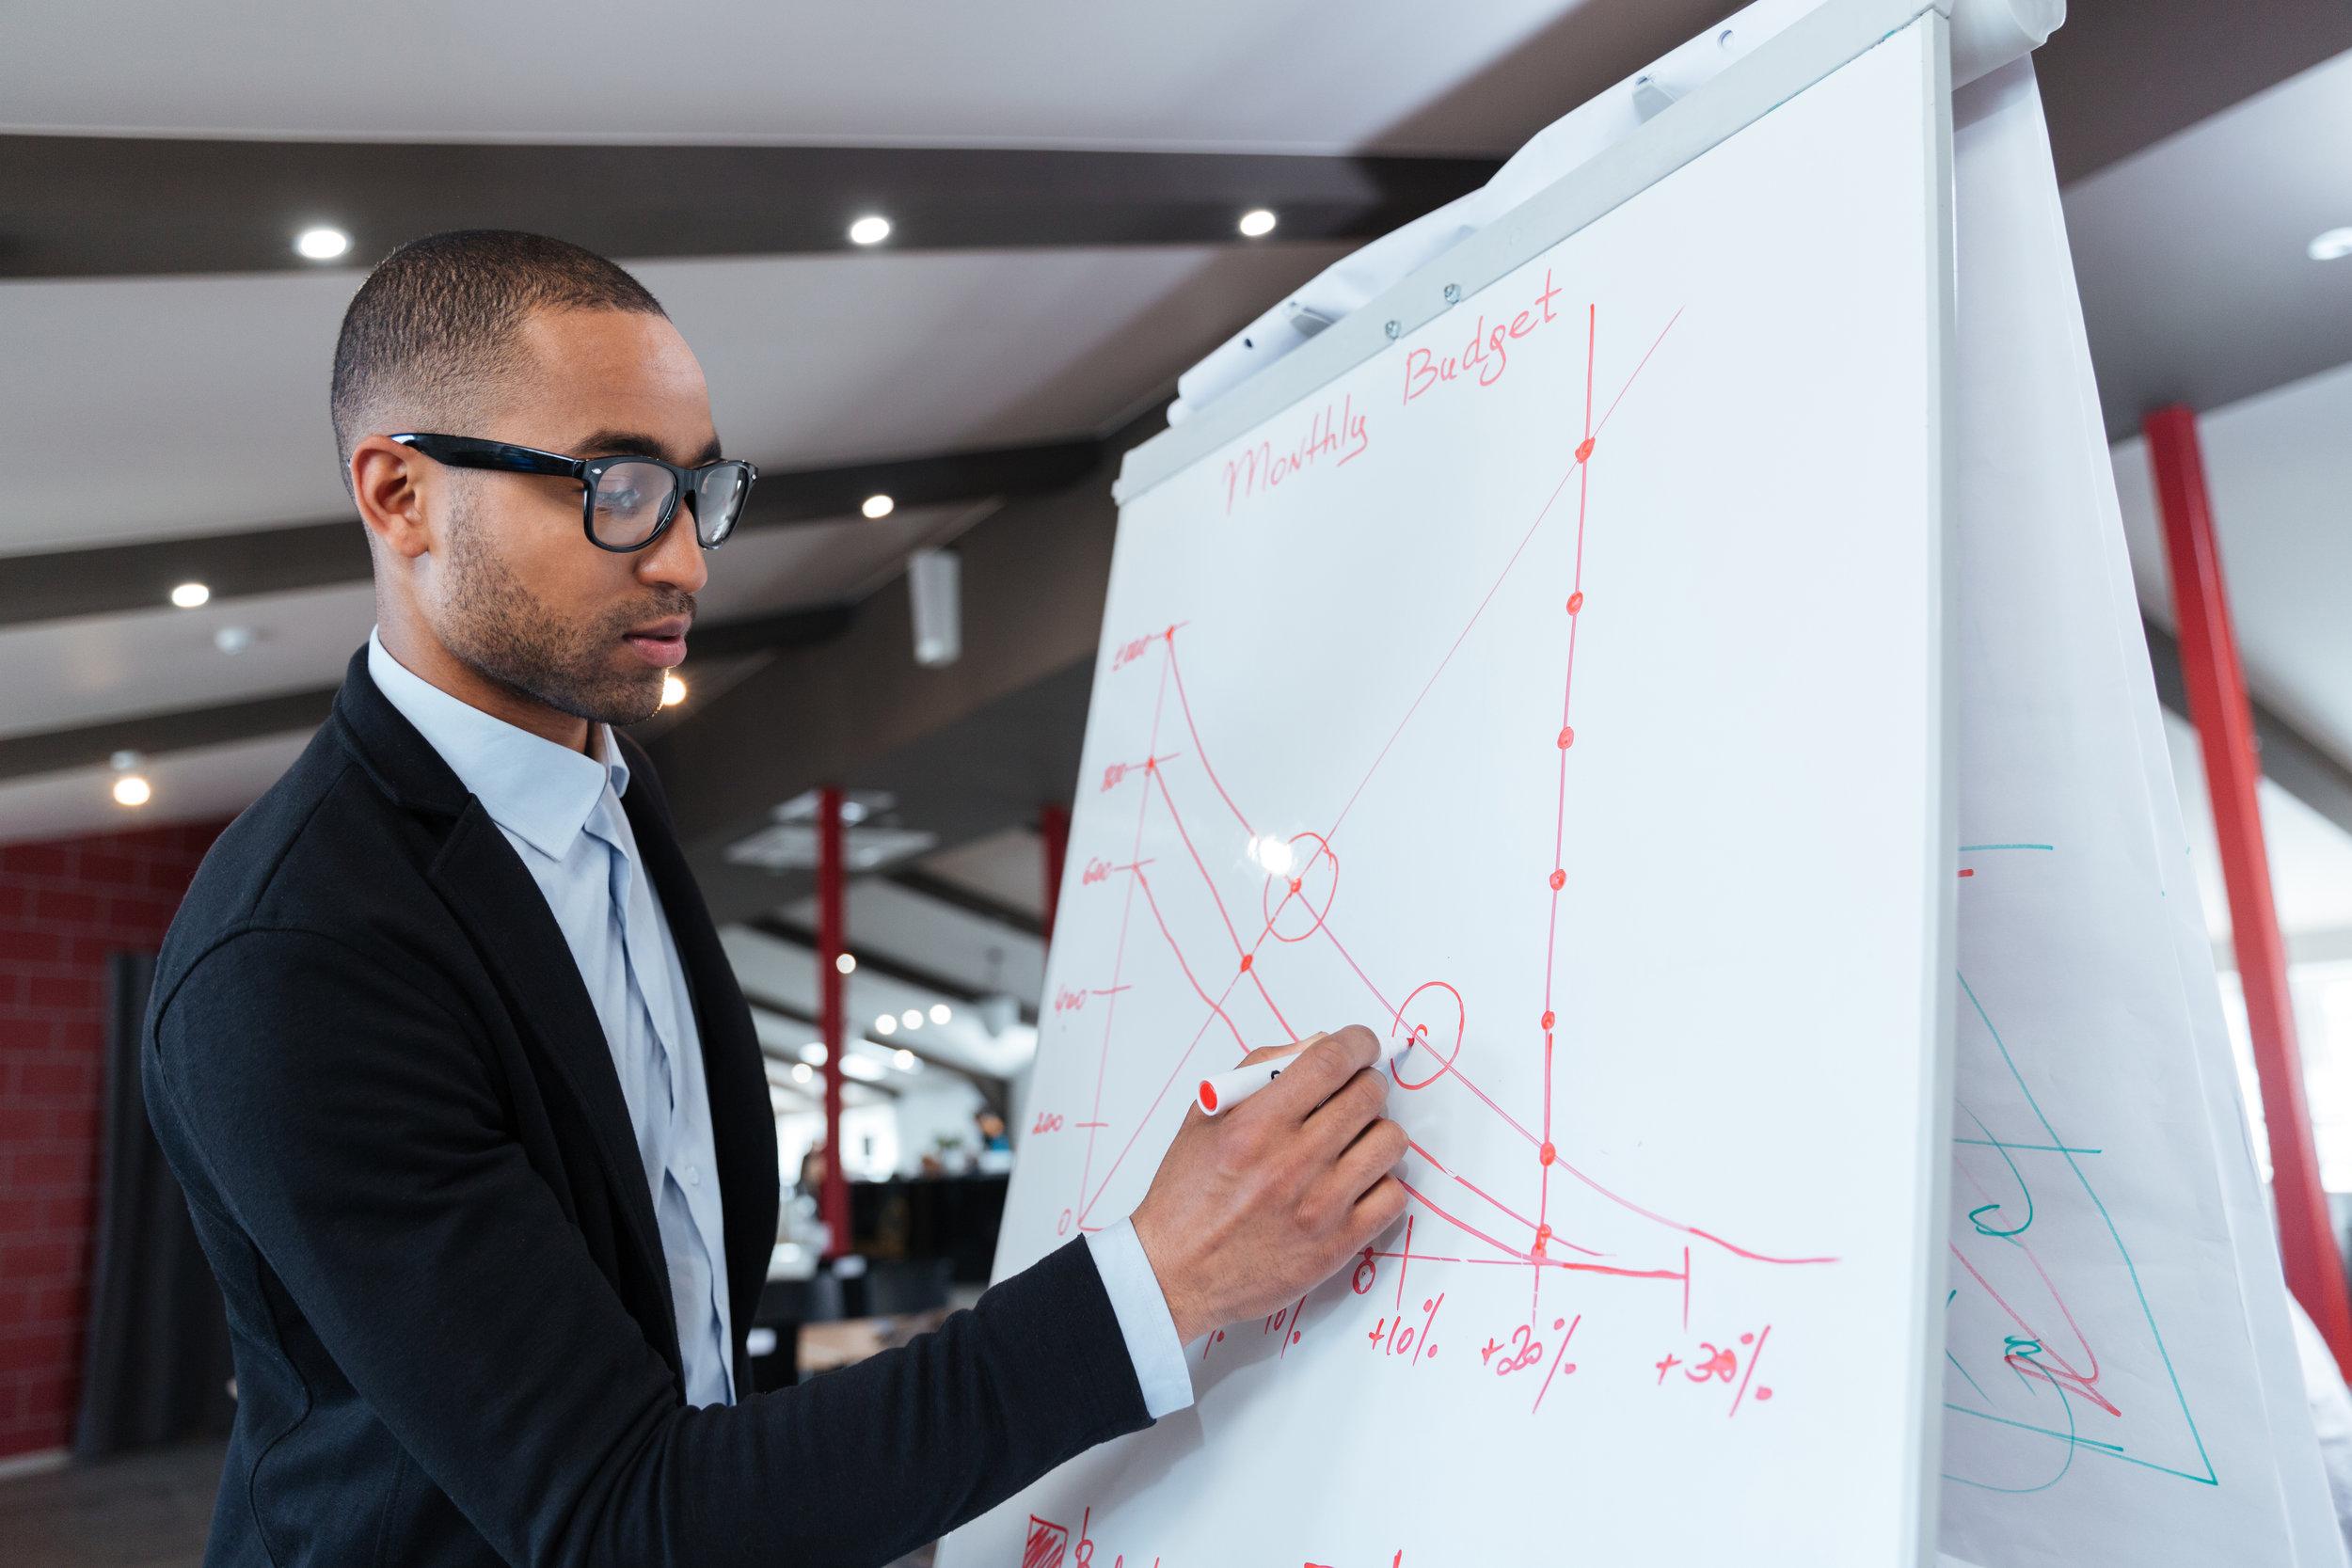 businessman-making-presentation-on-the-flipchart-PV4TGXX.jpg